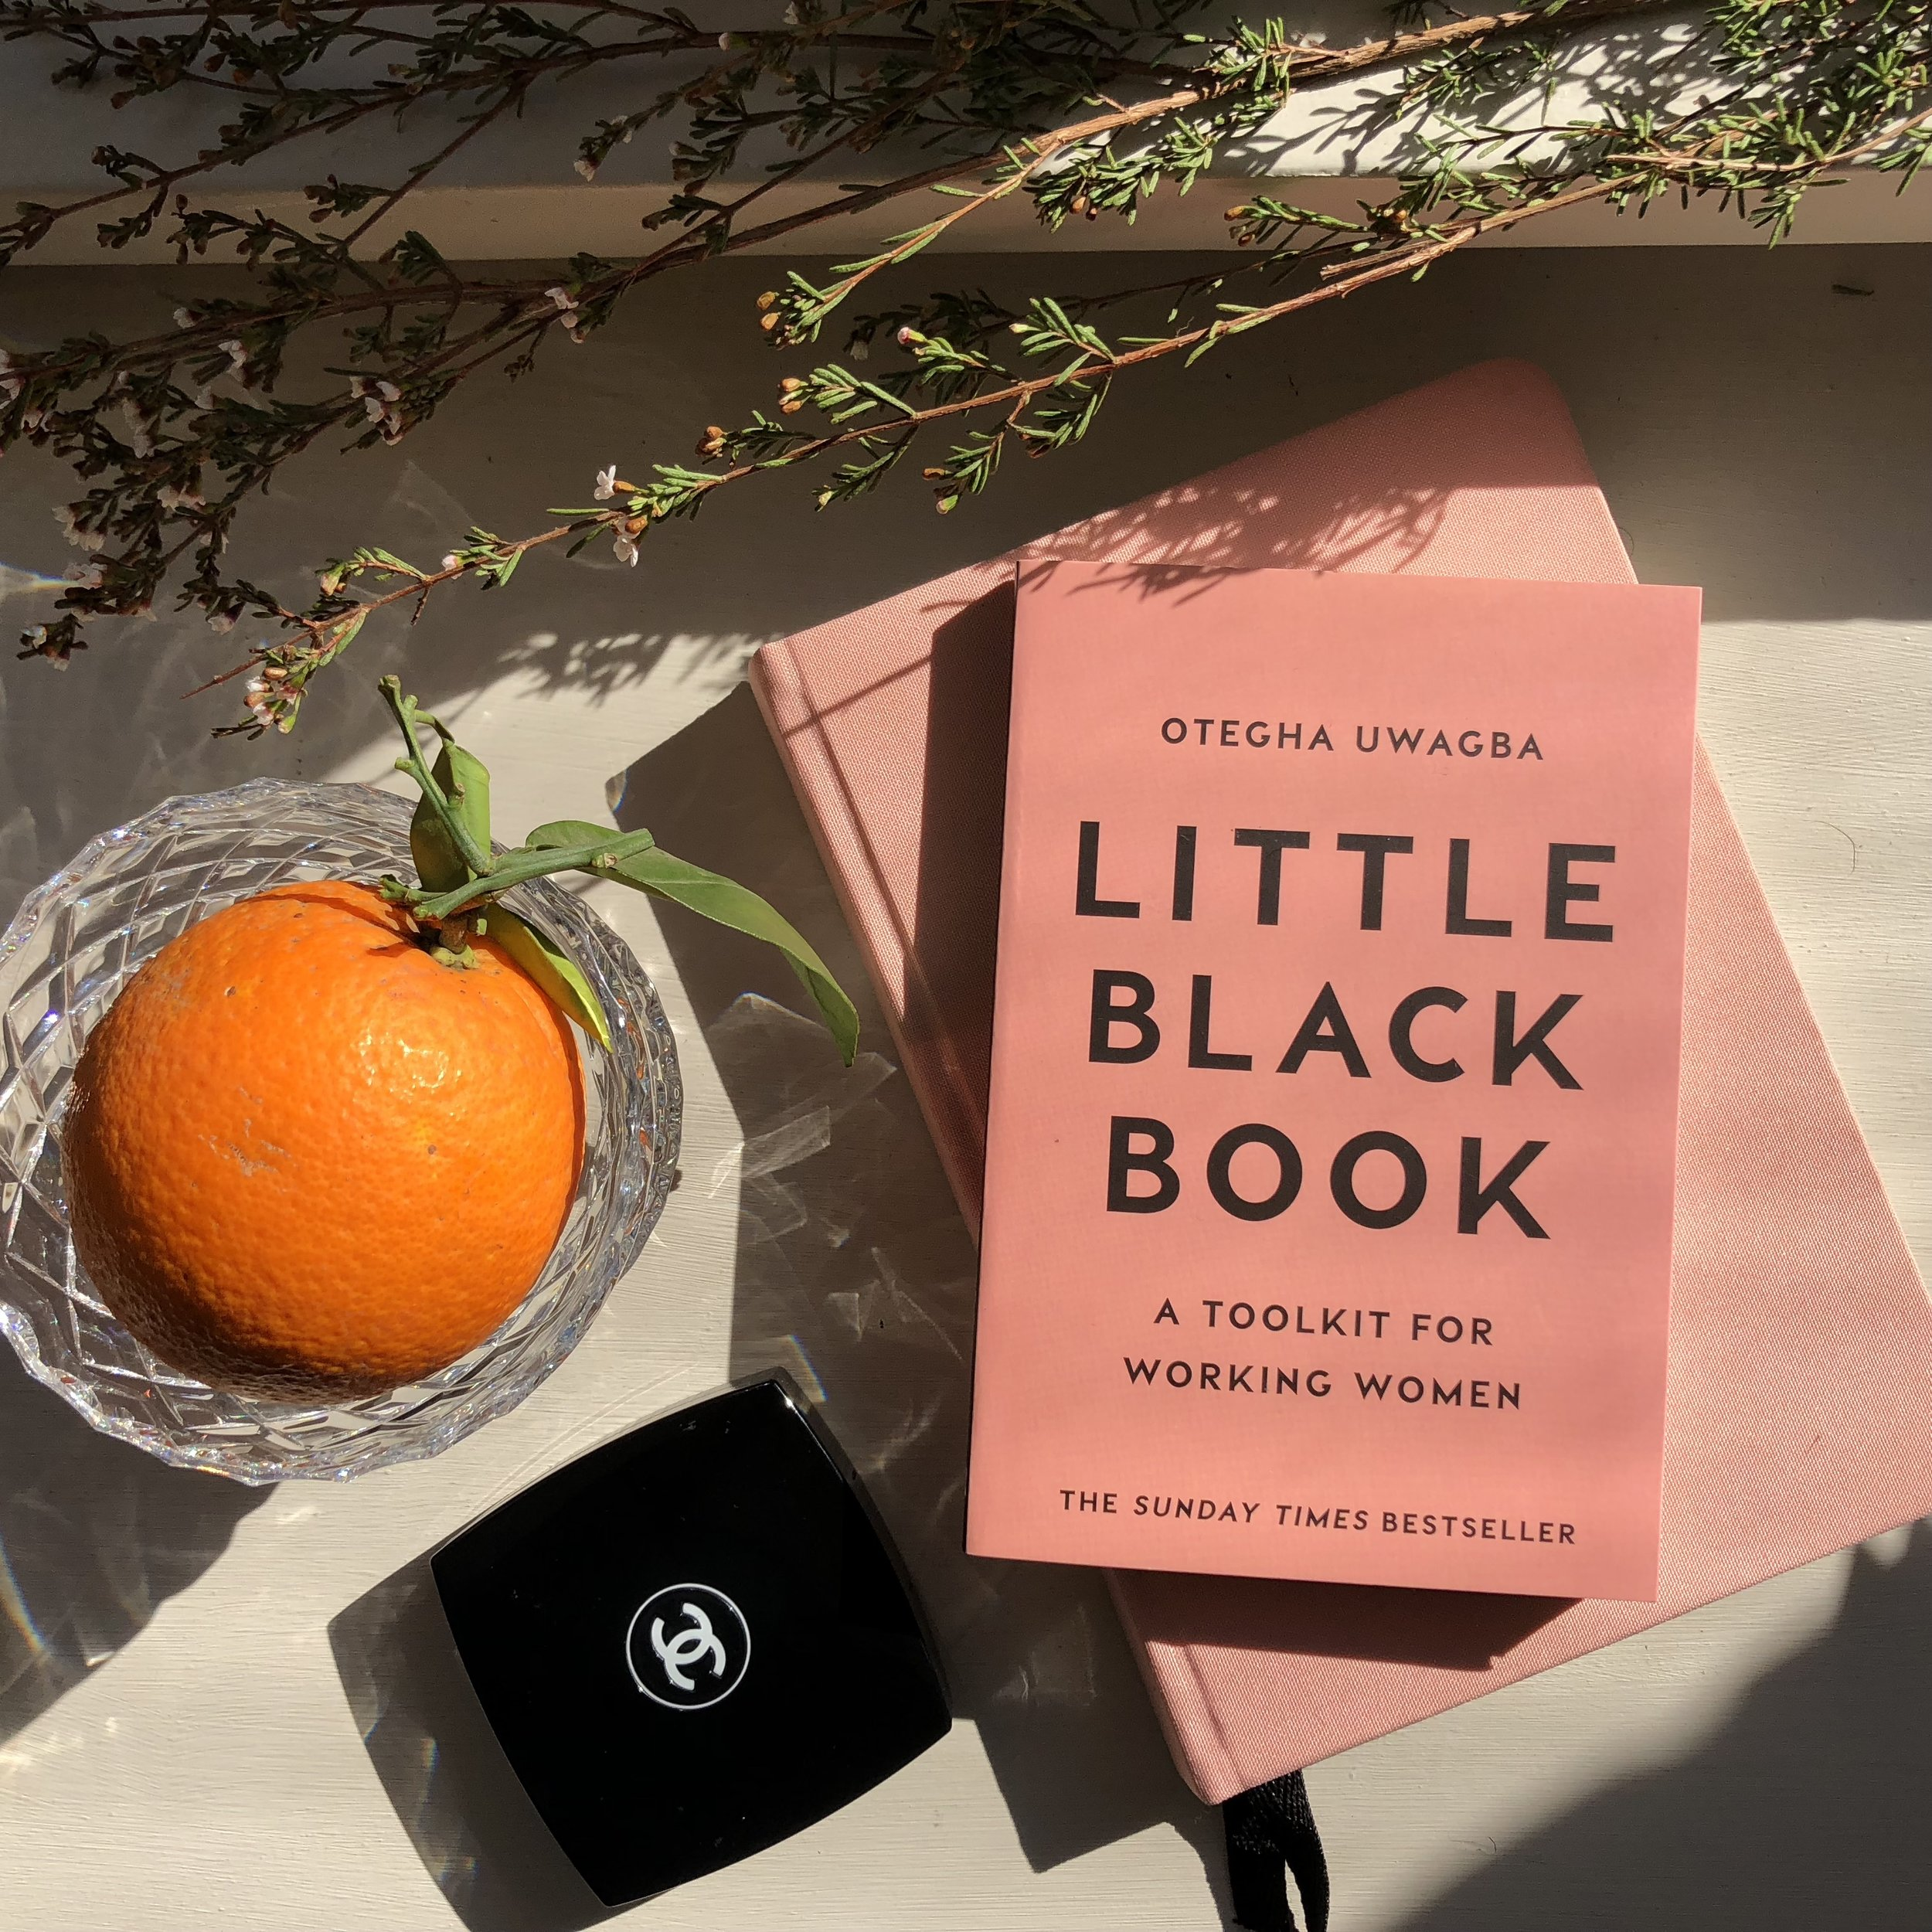 books-all-career-women-should-read-little-black-book-otegha.JPG